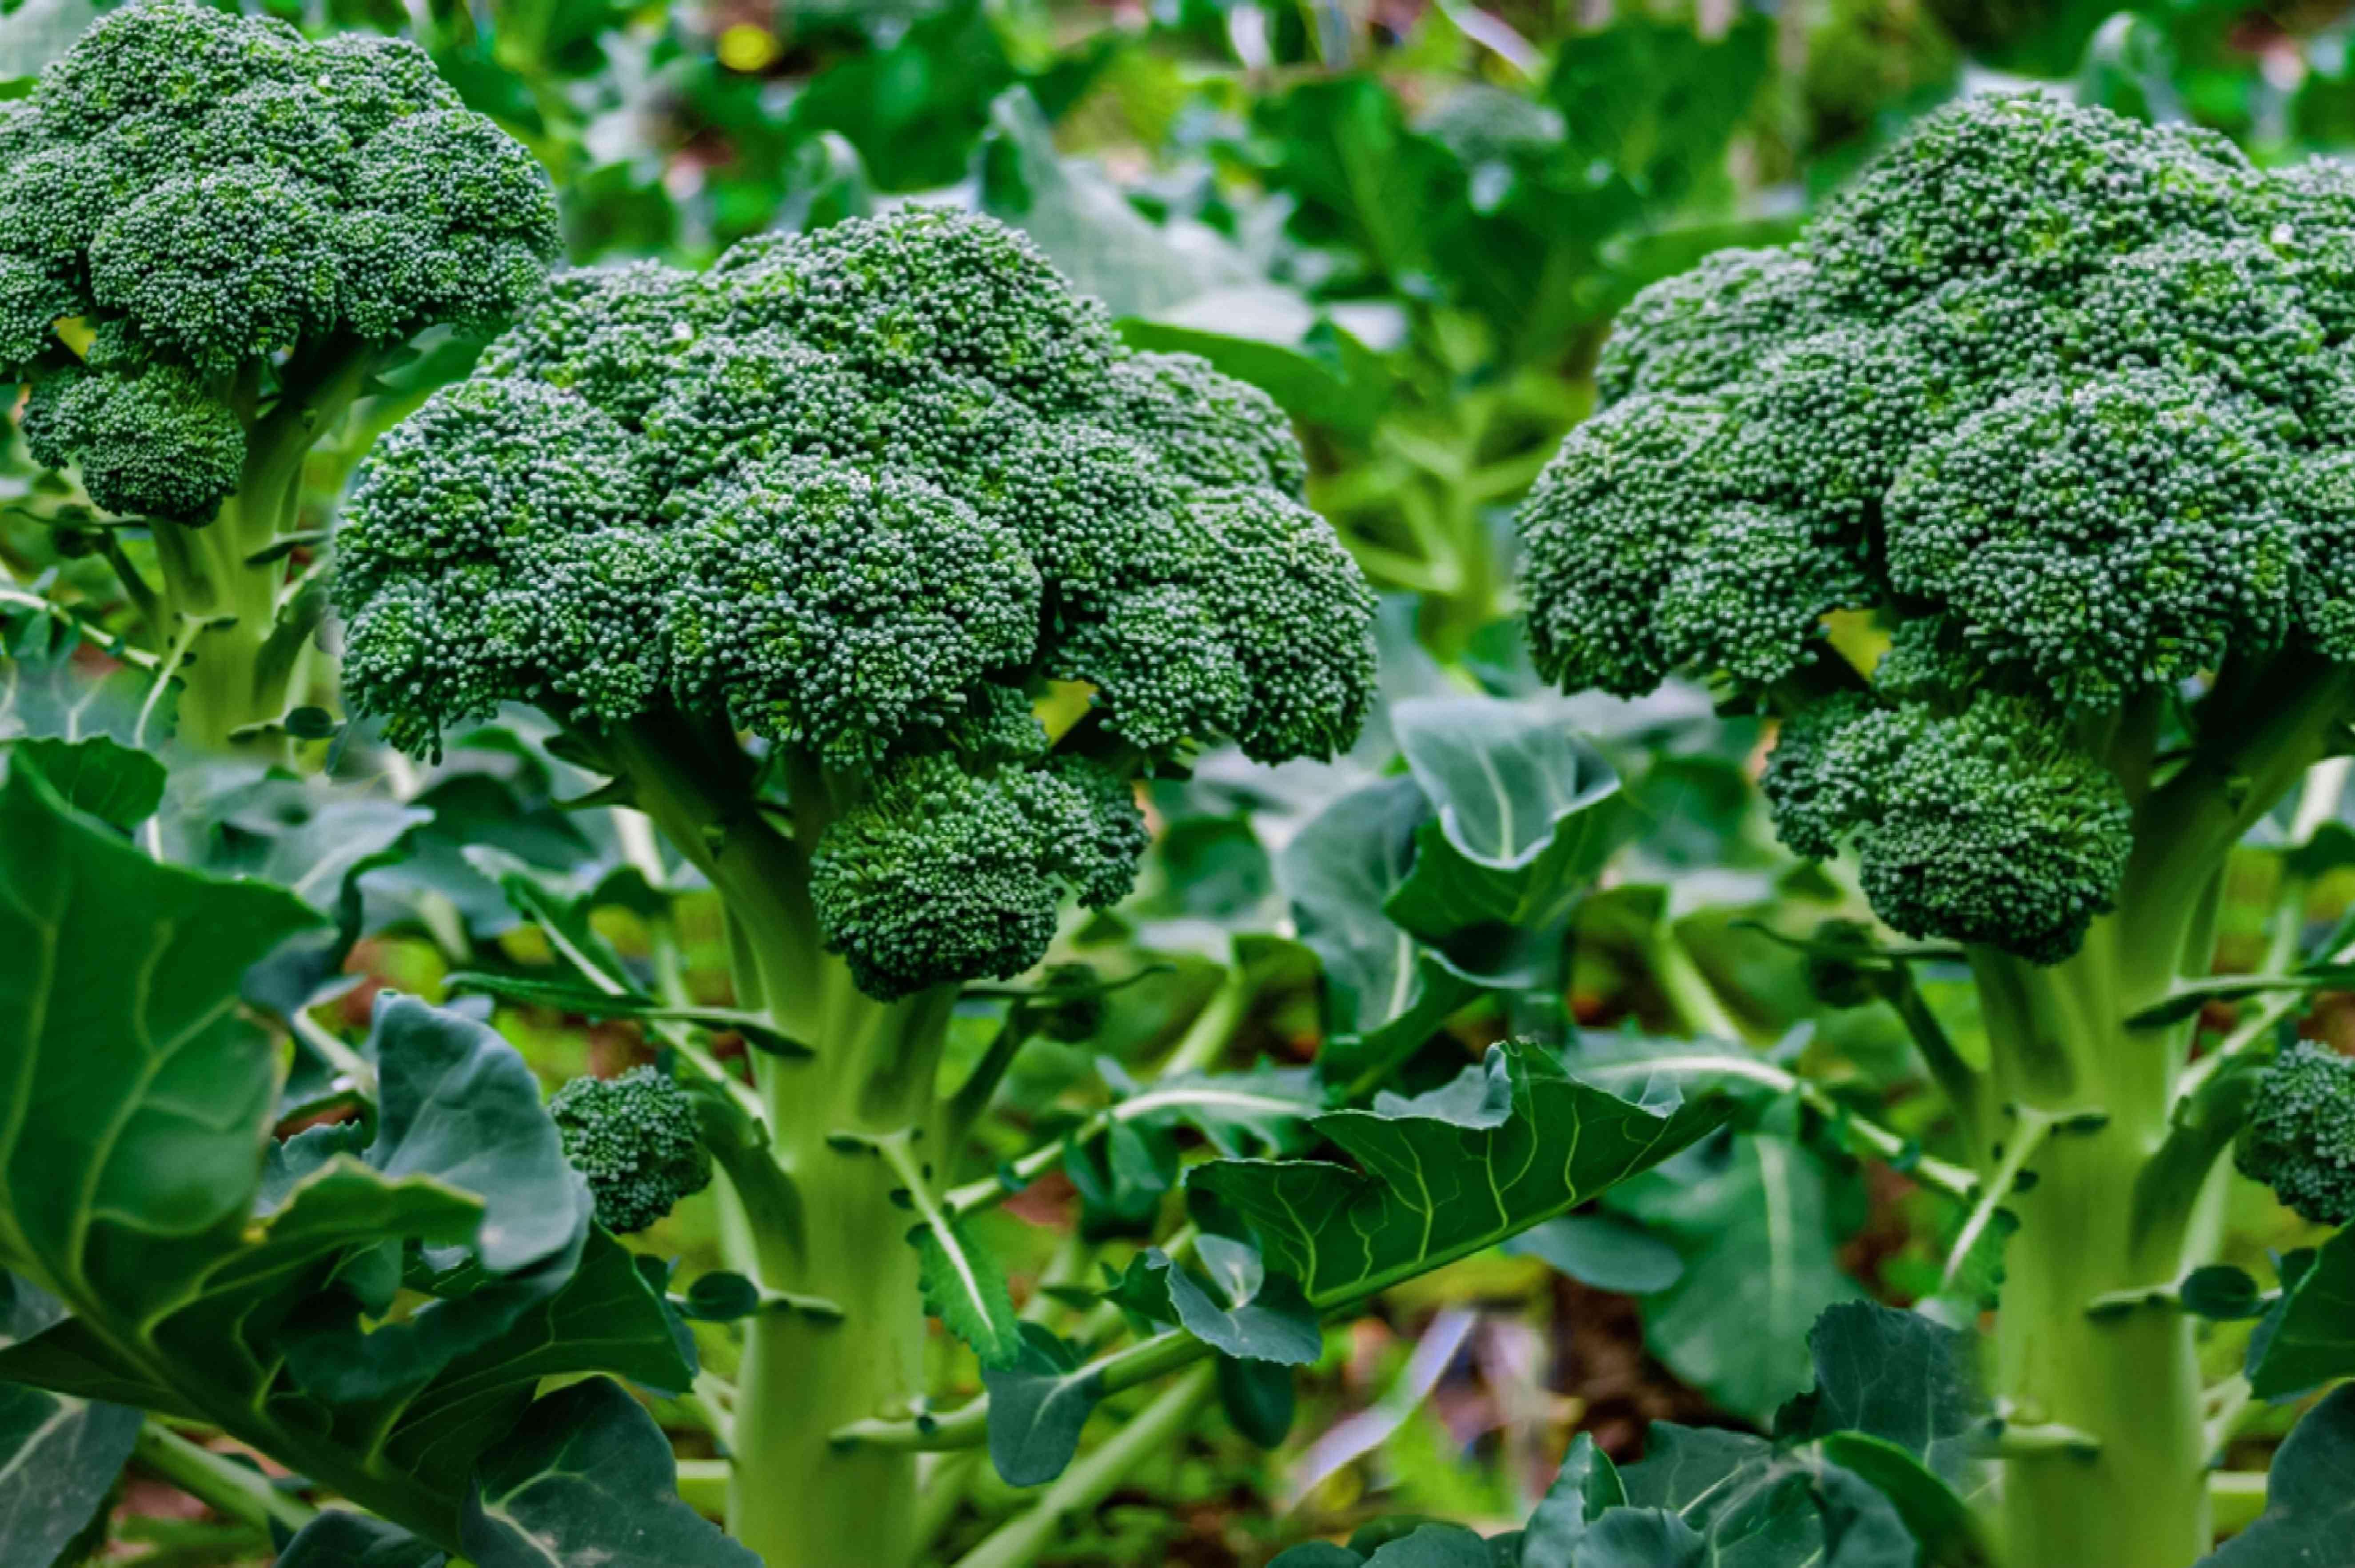 broccoli in the garden